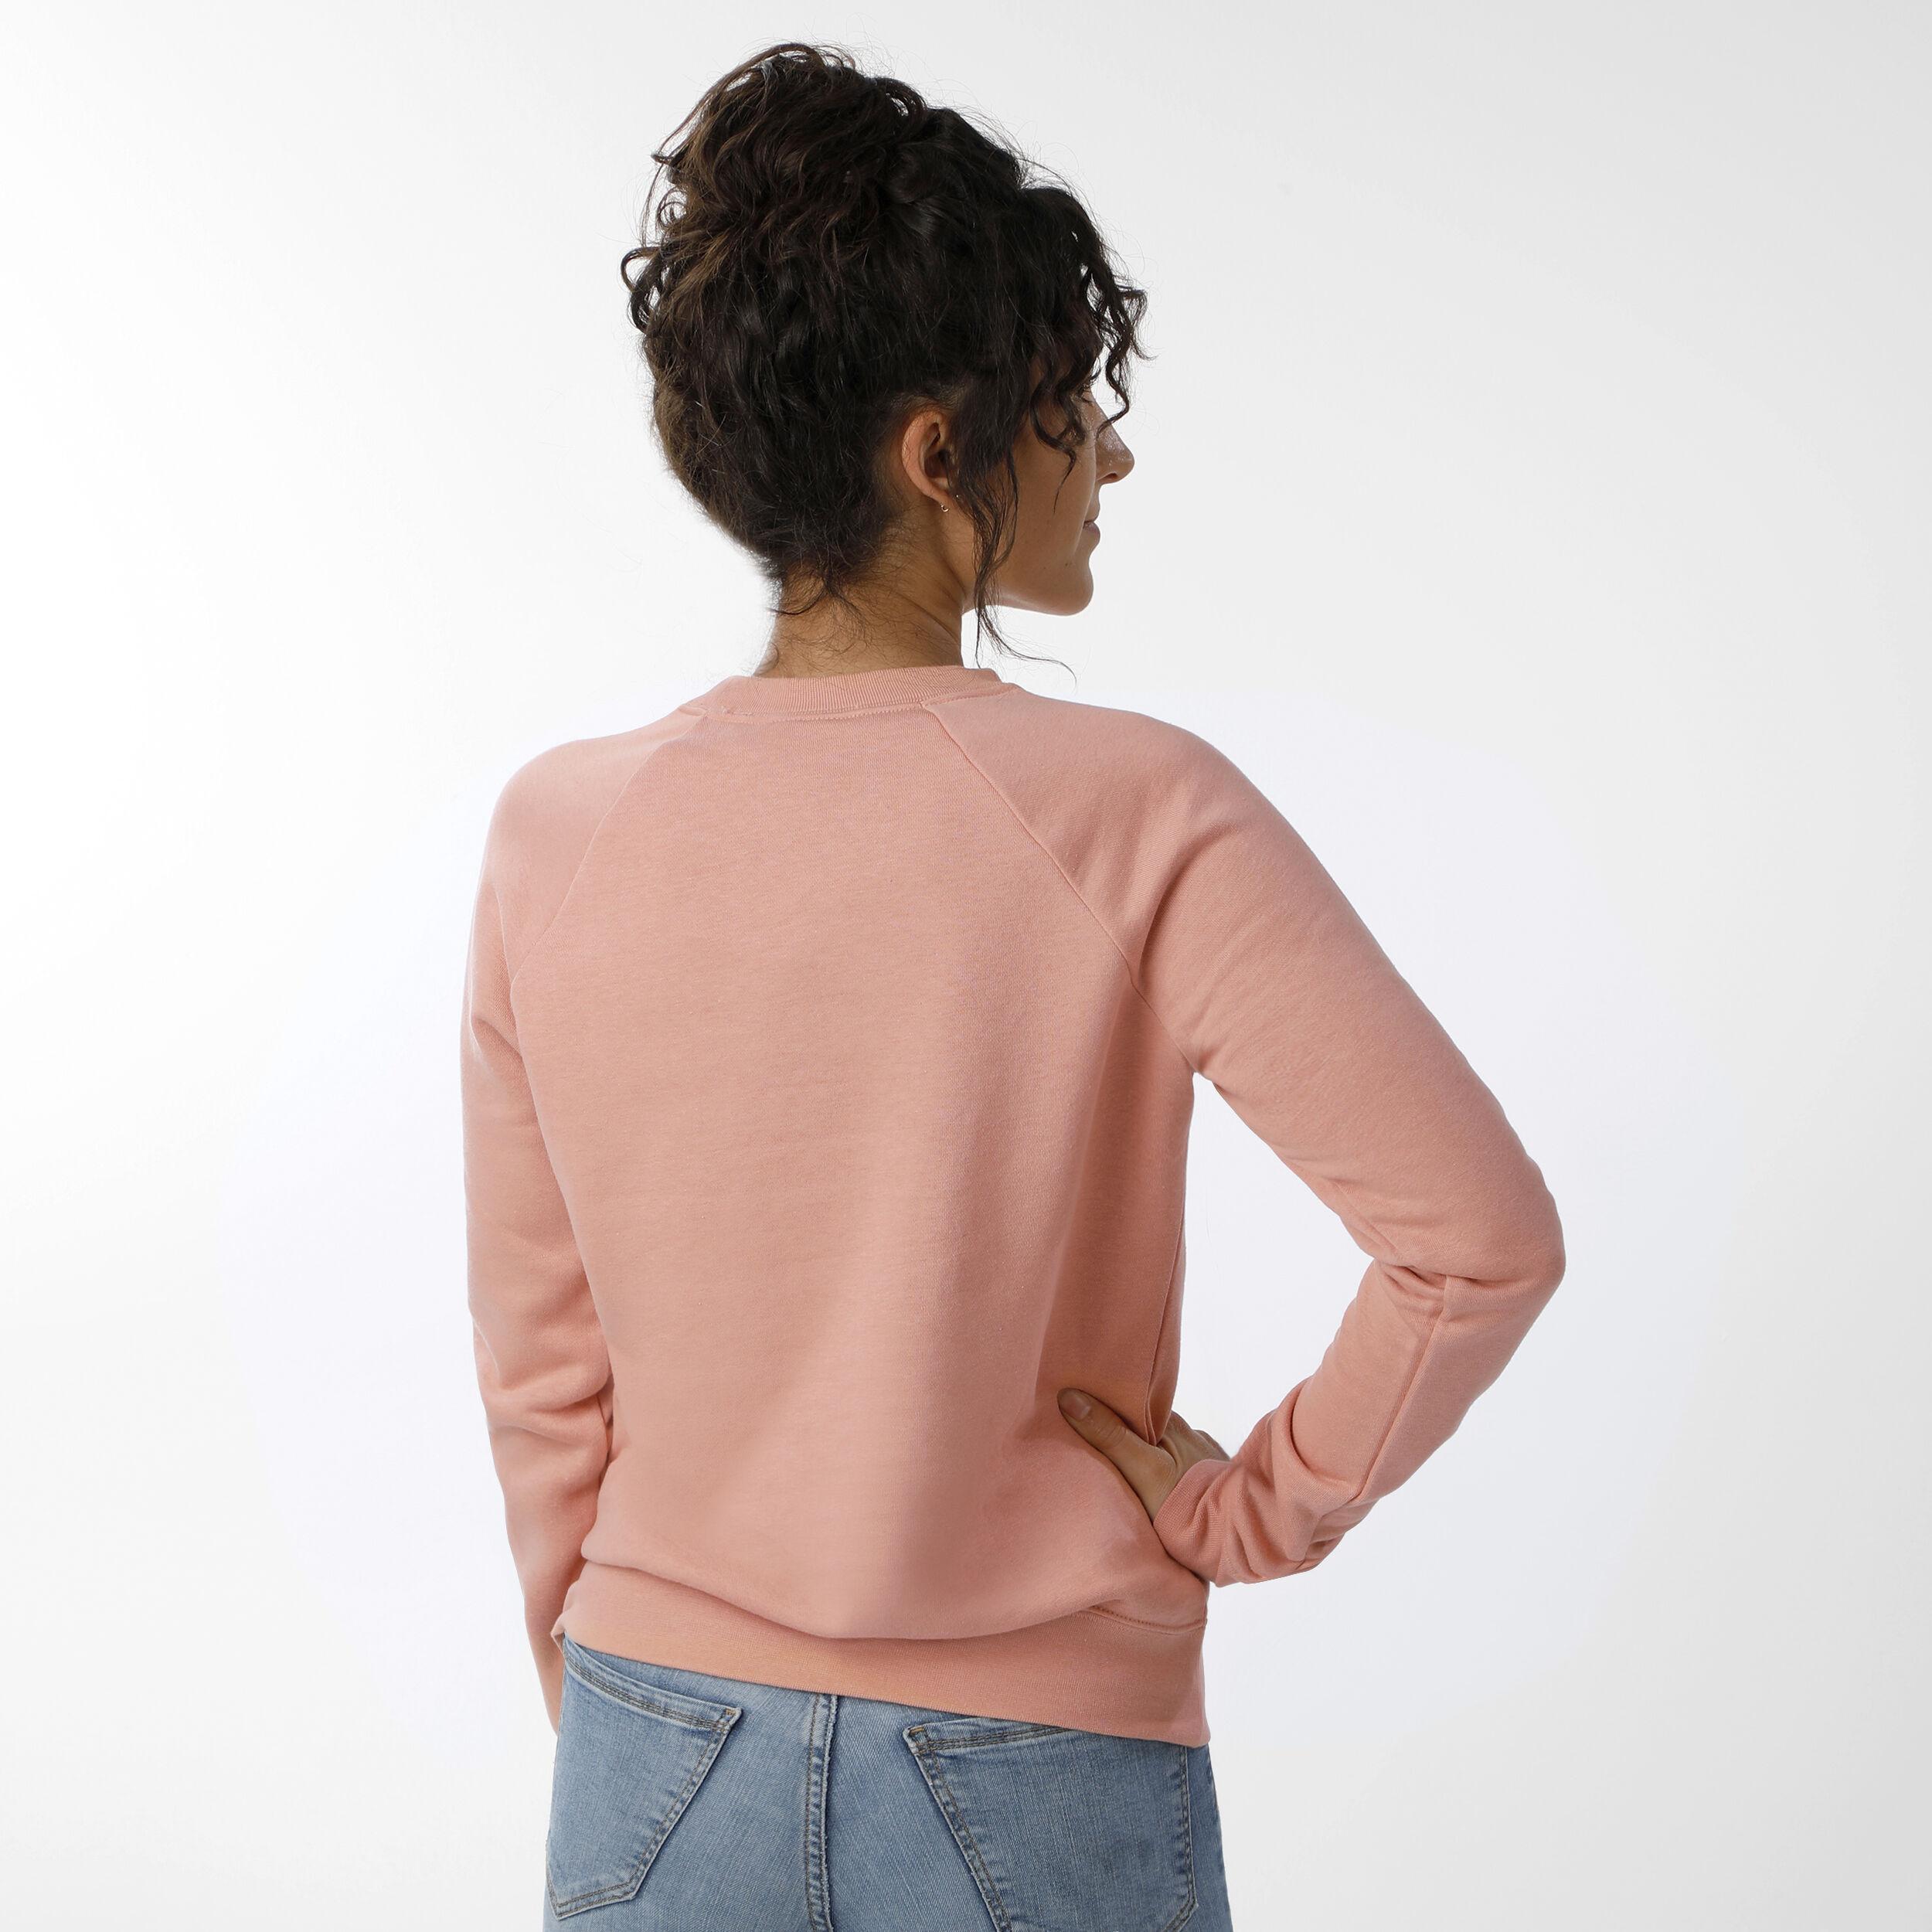 Nike Sportswear Essential Crew Sweatshirt Damen Apricot